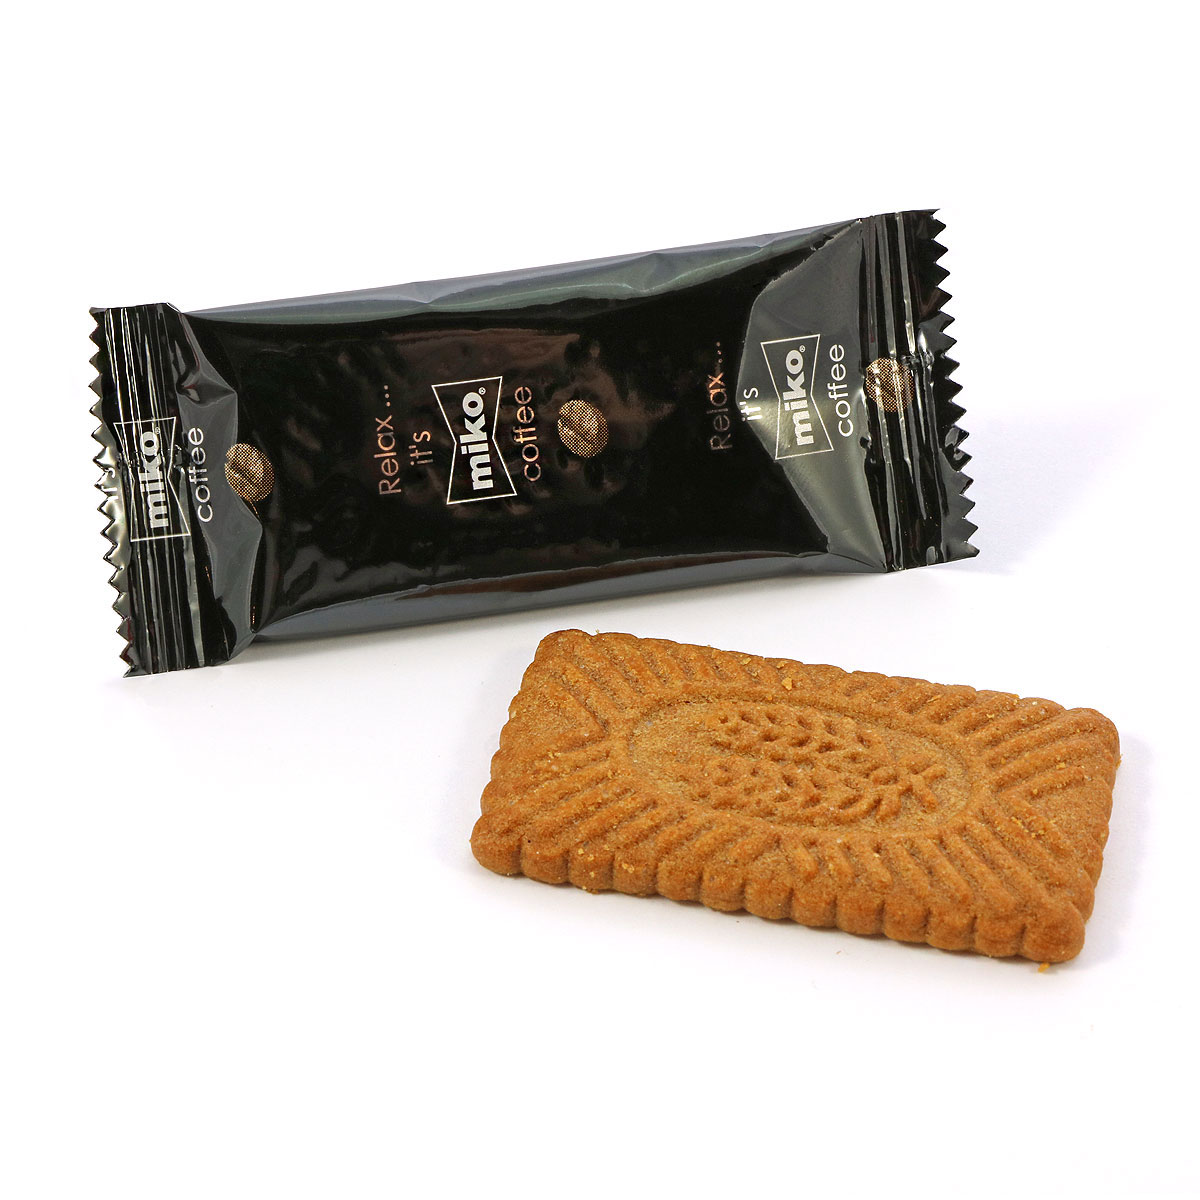 biscuits sp culoos en emballage individuel carton de 200. Black Bedroom Furniture Sets. Home Design Ideas